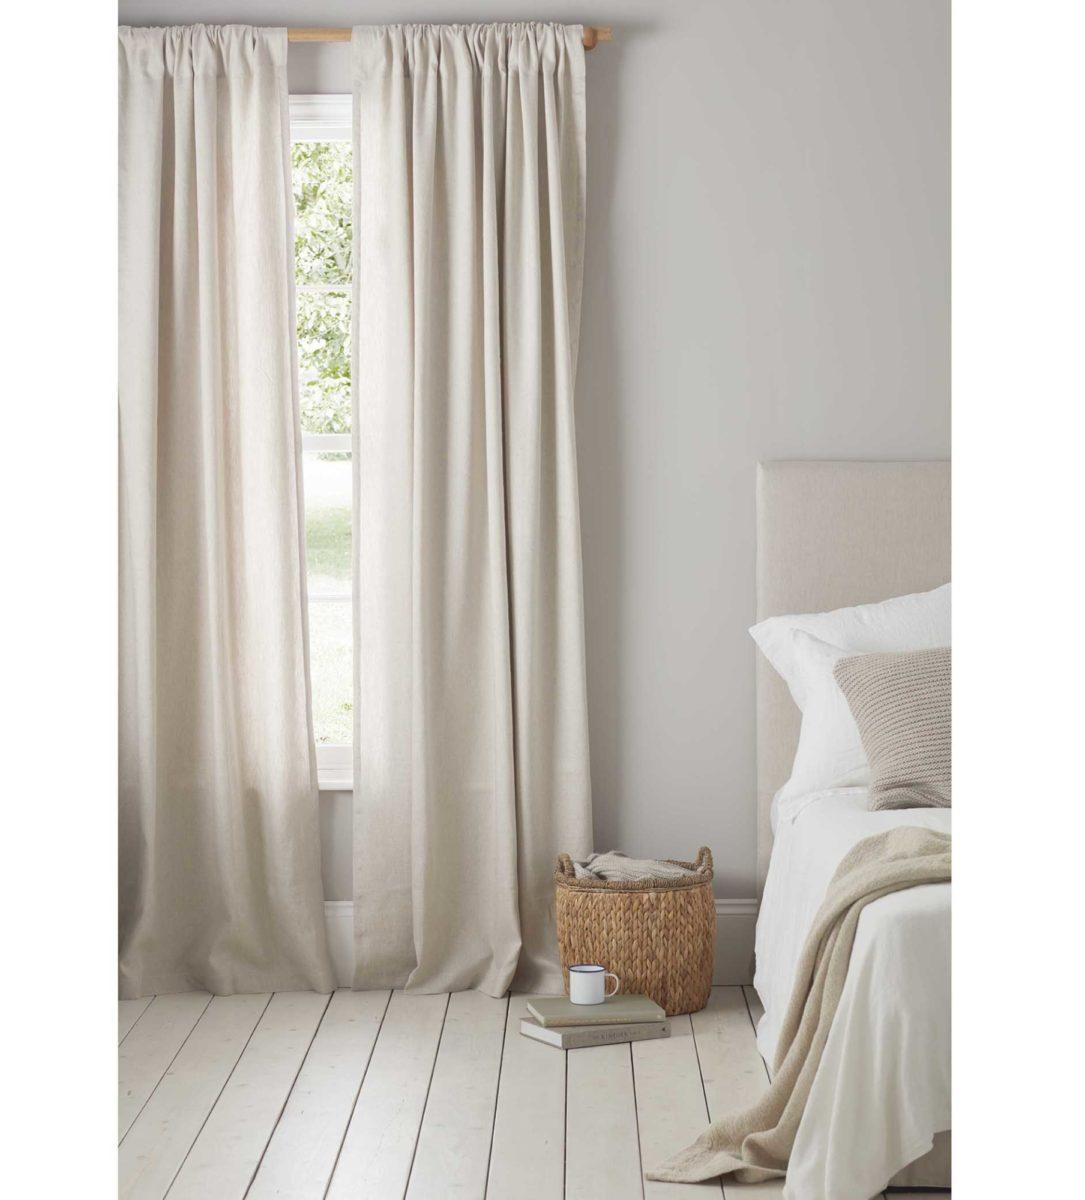 Natural Linen Loop Top Curtains Pair 50 Linen 50 Cotton